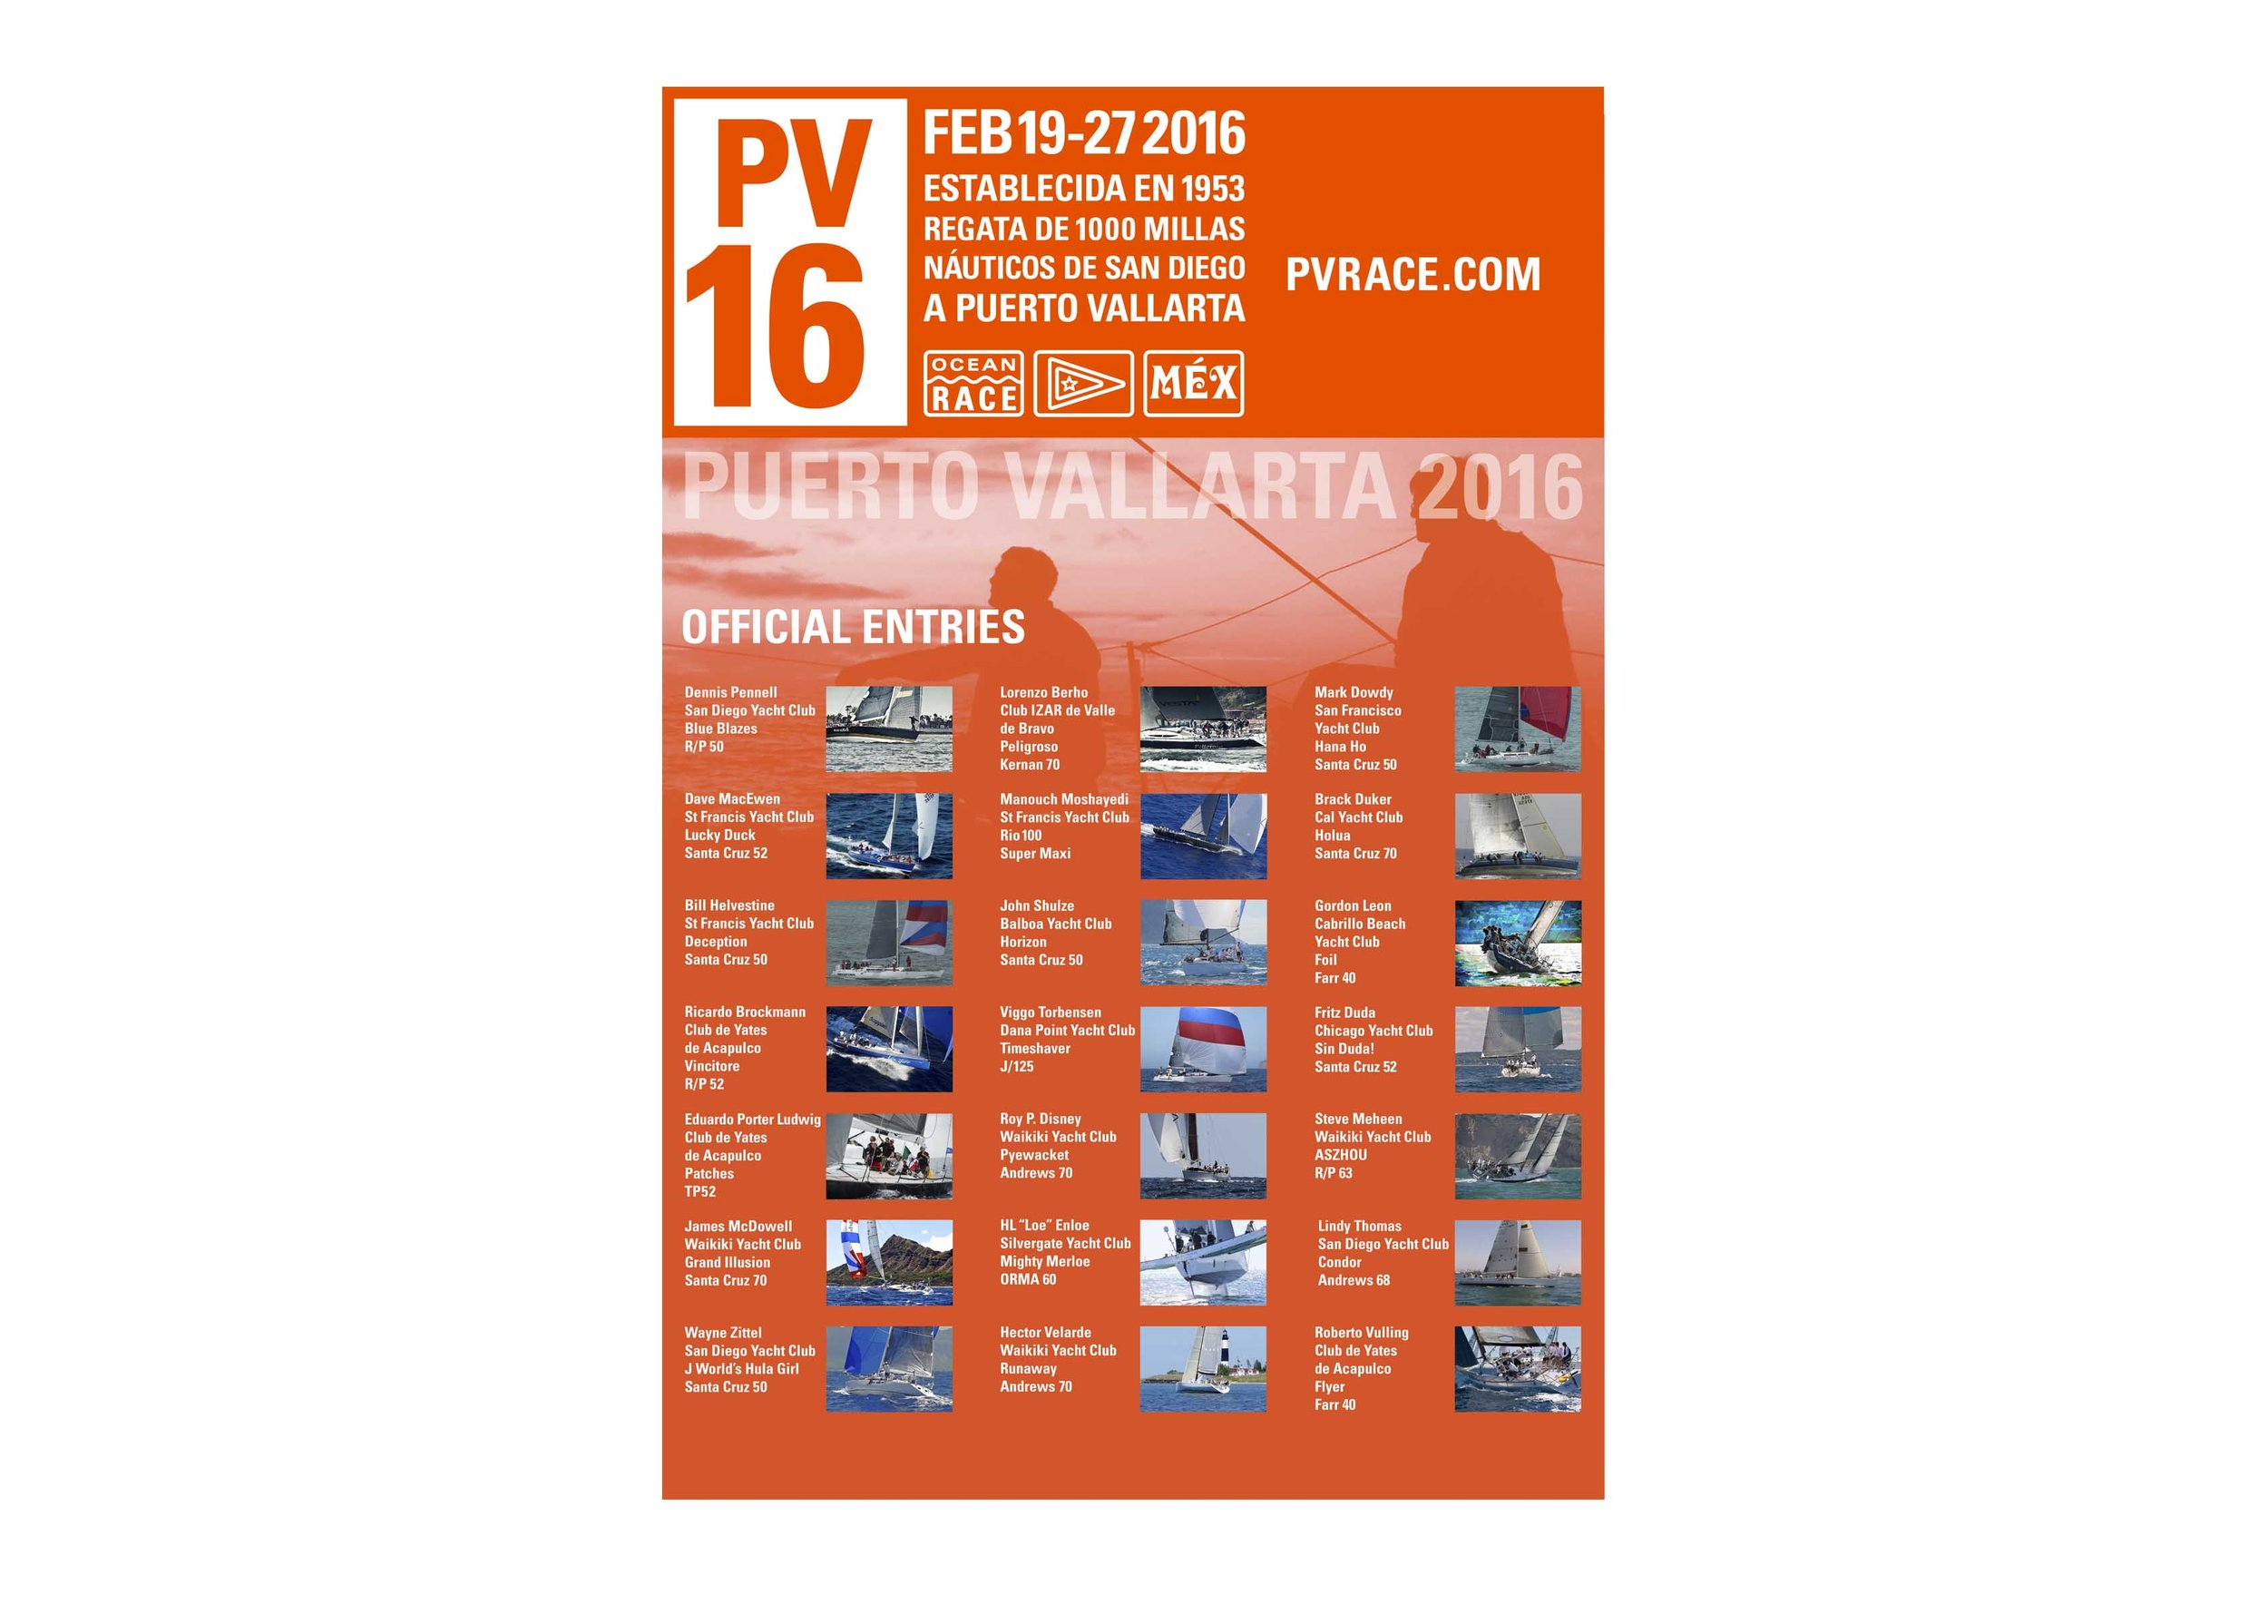 pv2016_portfolio_2016_poster_orange_rgc.jpg